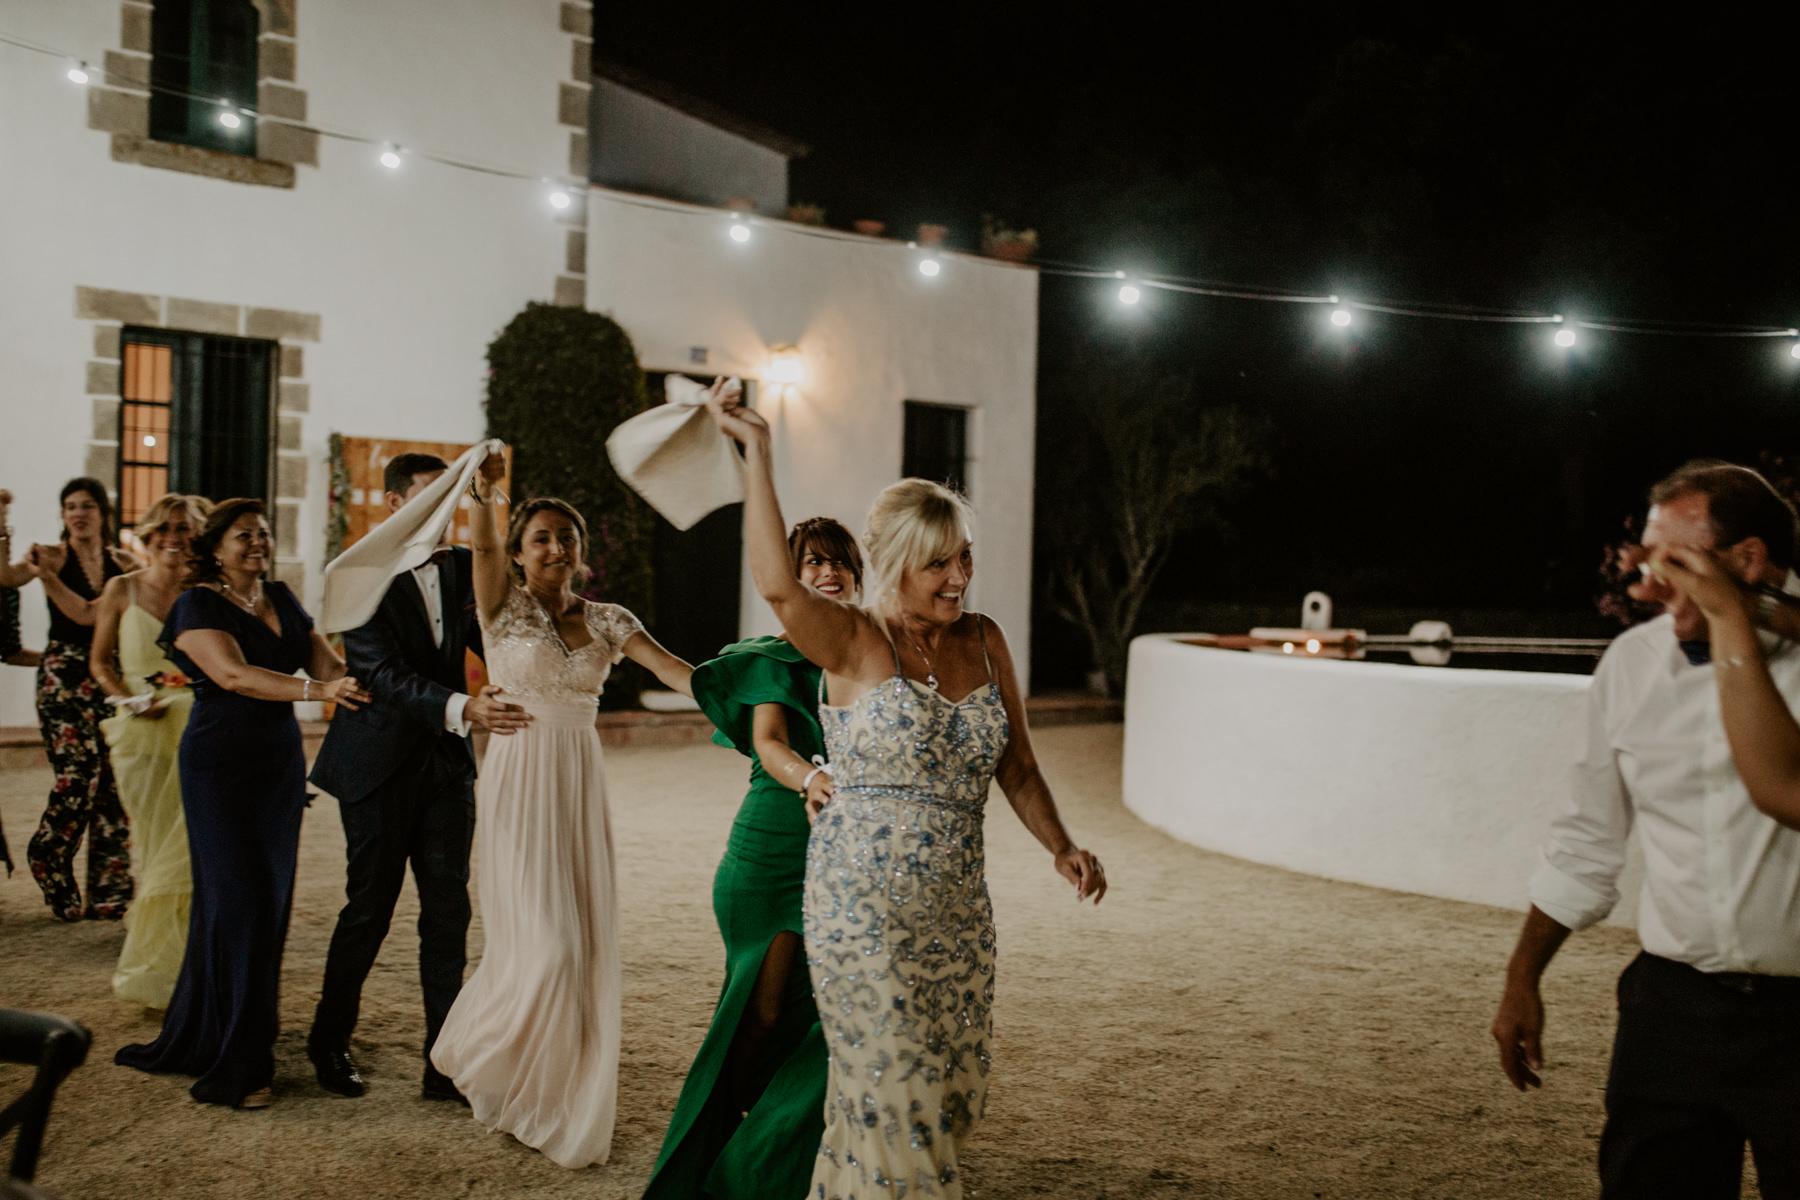 alt_thenortherngirlphotography_couples_weddingphotographer_photographer_wedding_boda_fotografodebodas_fotografobodasbarcelona_bodaindie_bodasconestilo_bodaensantperedeclara_jennifermiguel-820.jpg